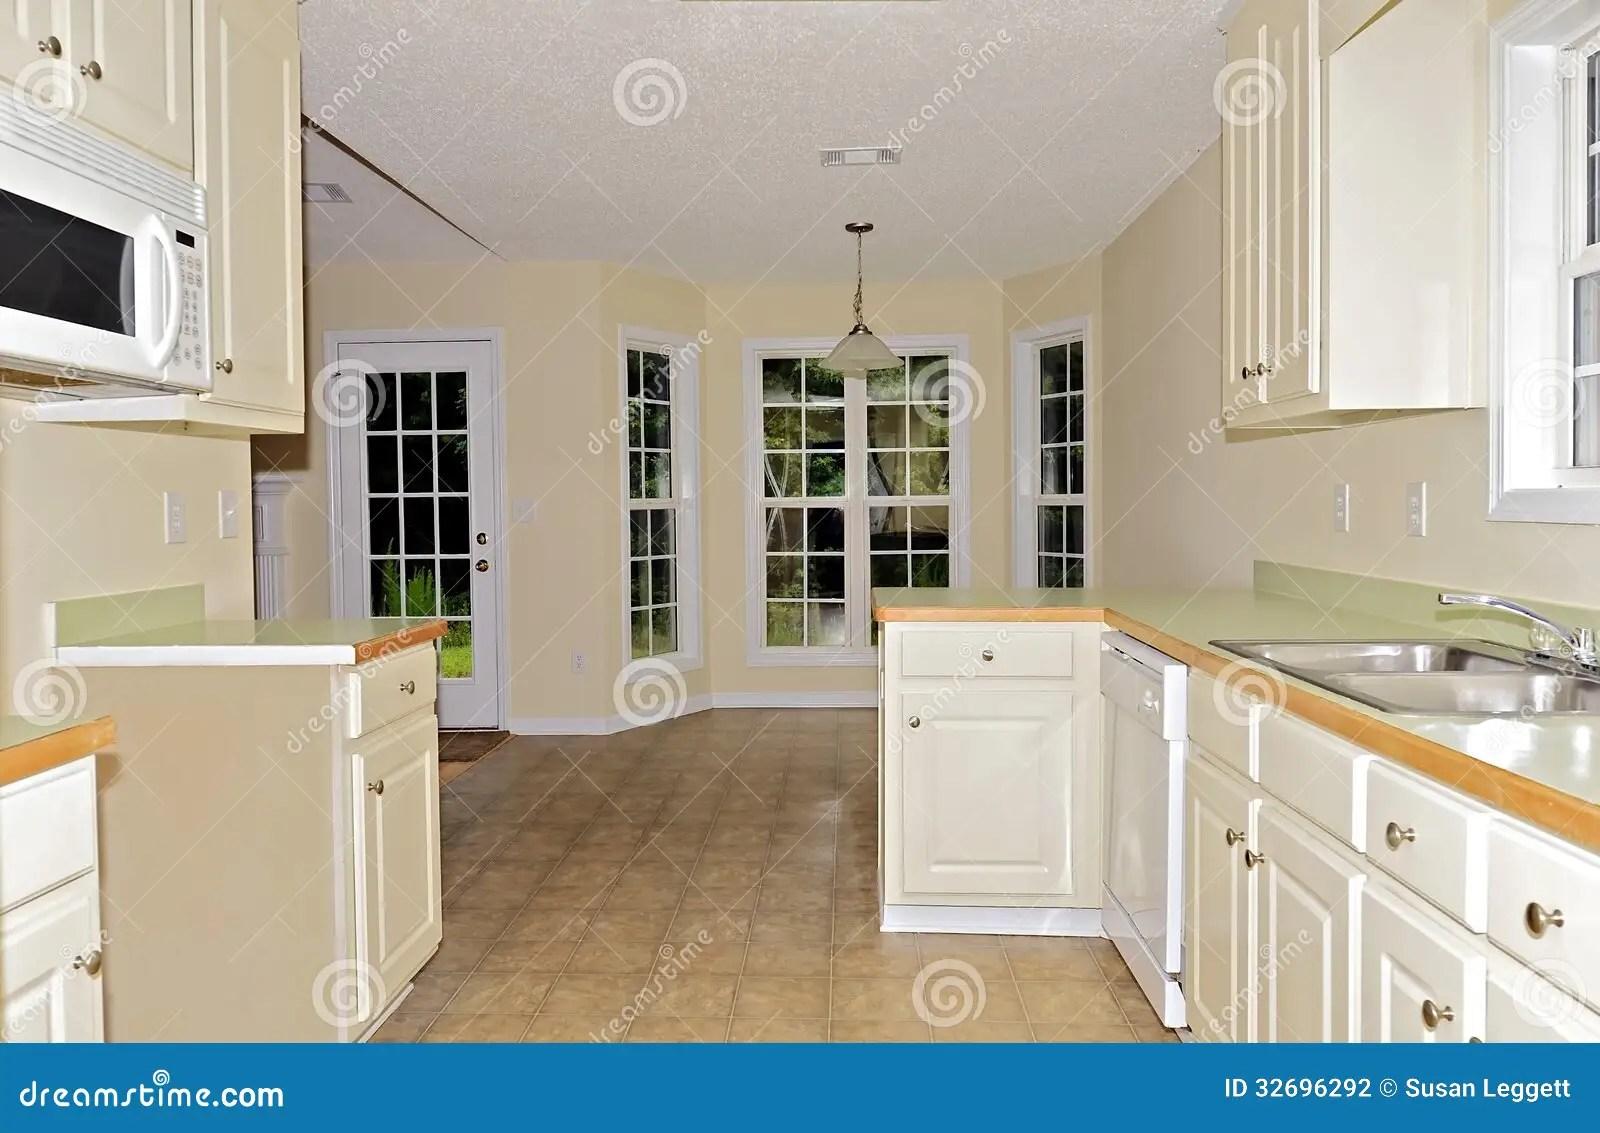 small kitchen sinks round table seats 8 小厨房饭厅库存照片 图片包括有水槽 安排 法国 空间 计数器 存贮 对饭厅的一个看法从没有火炉的一个小厨房